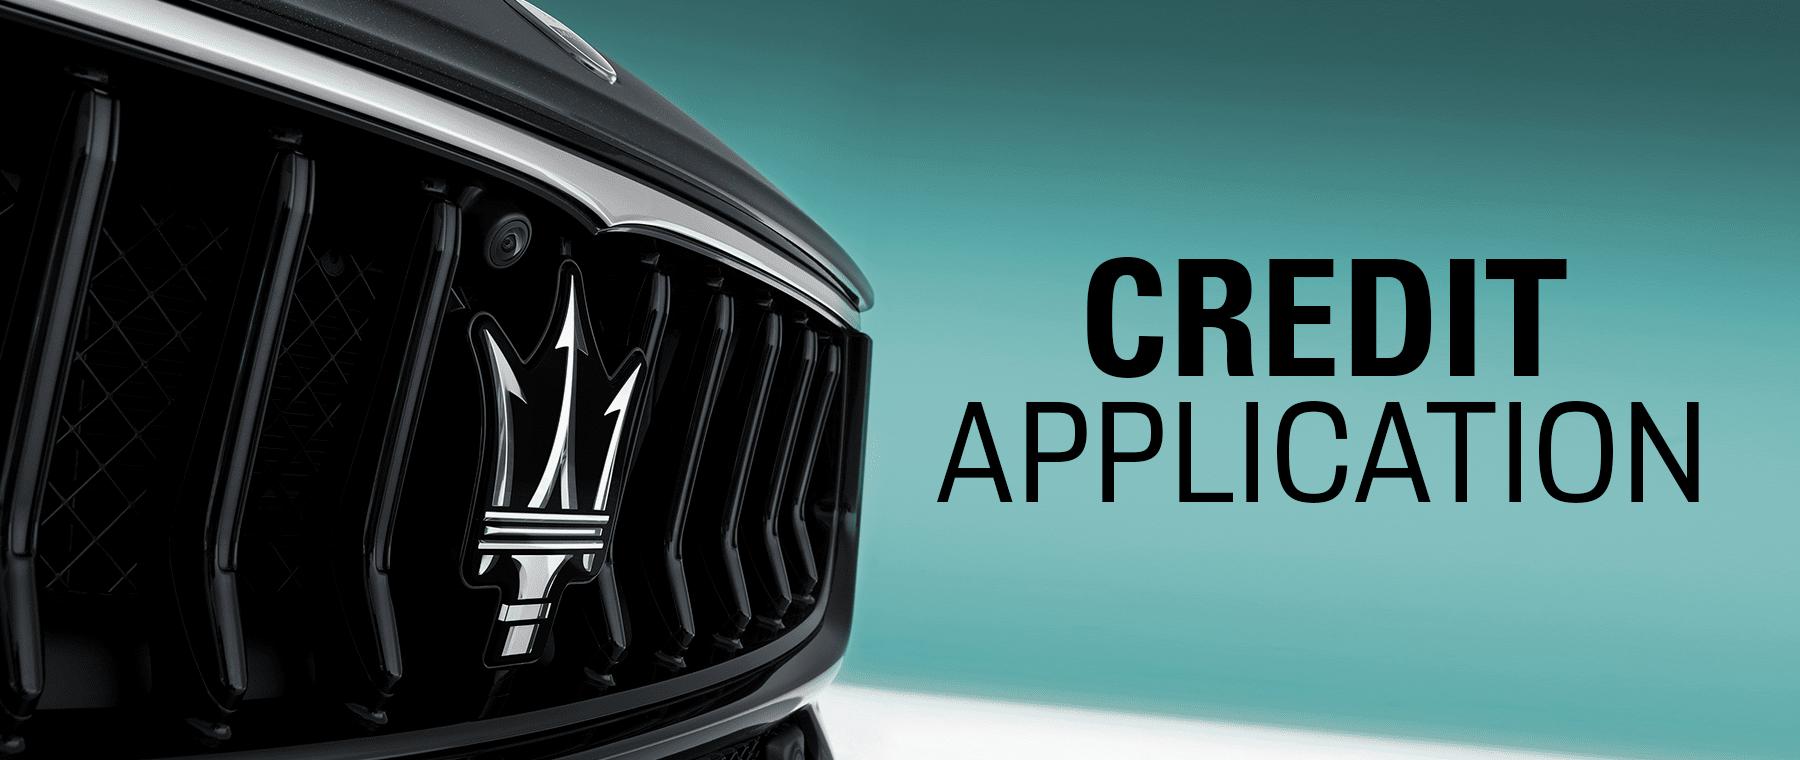 Maserati Credit Application